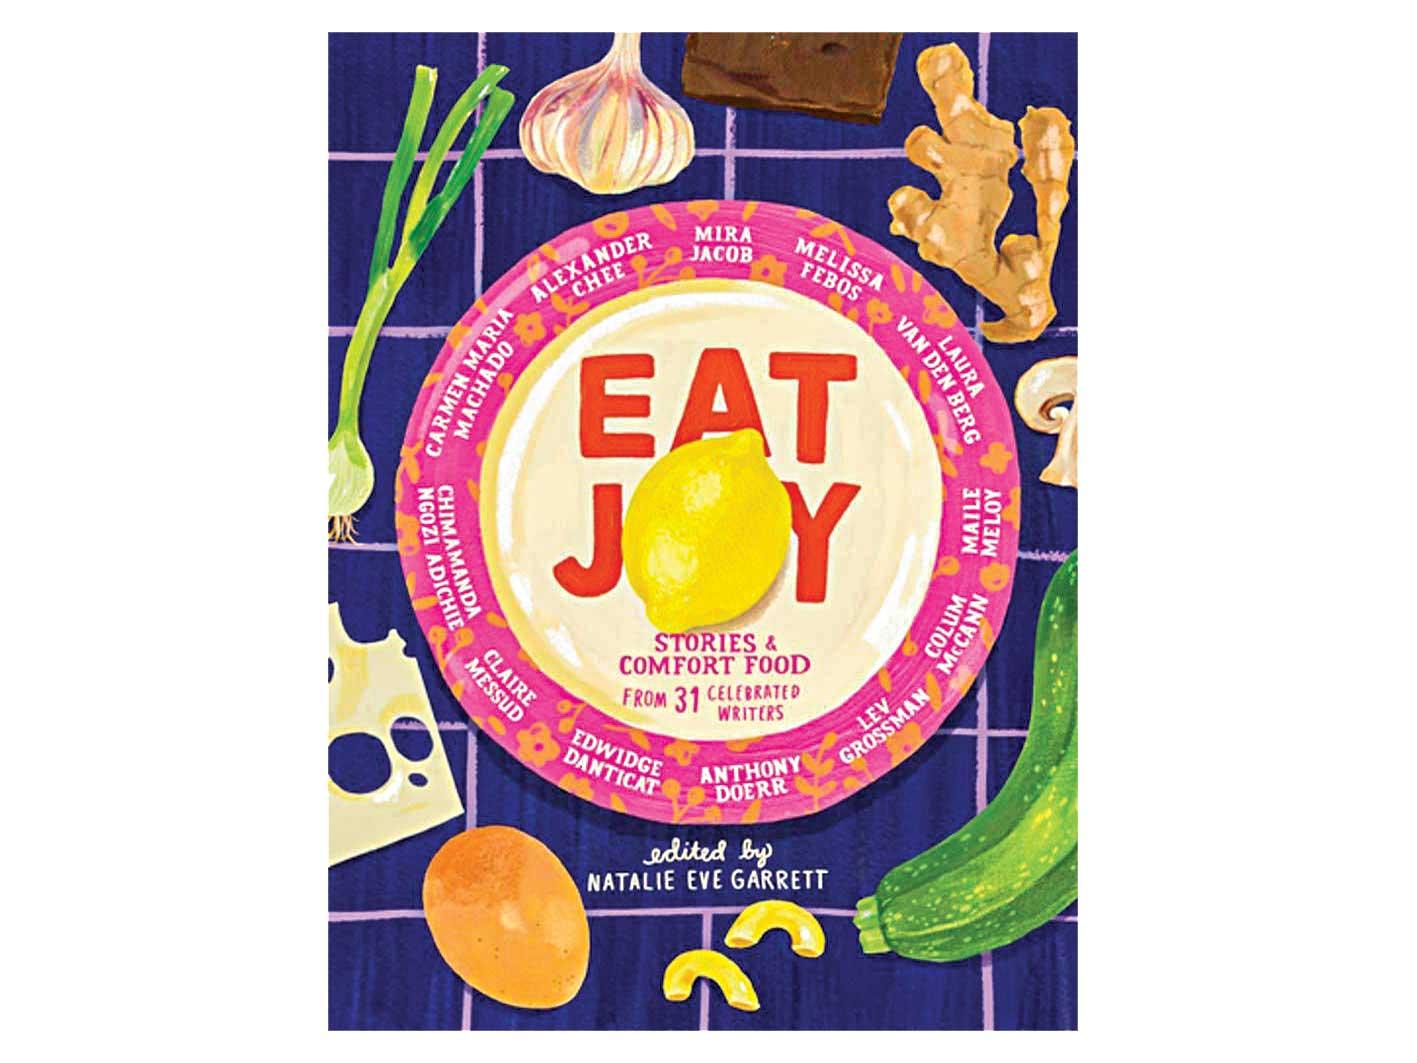 Eat Joy book by Natalie Eve Garrett.